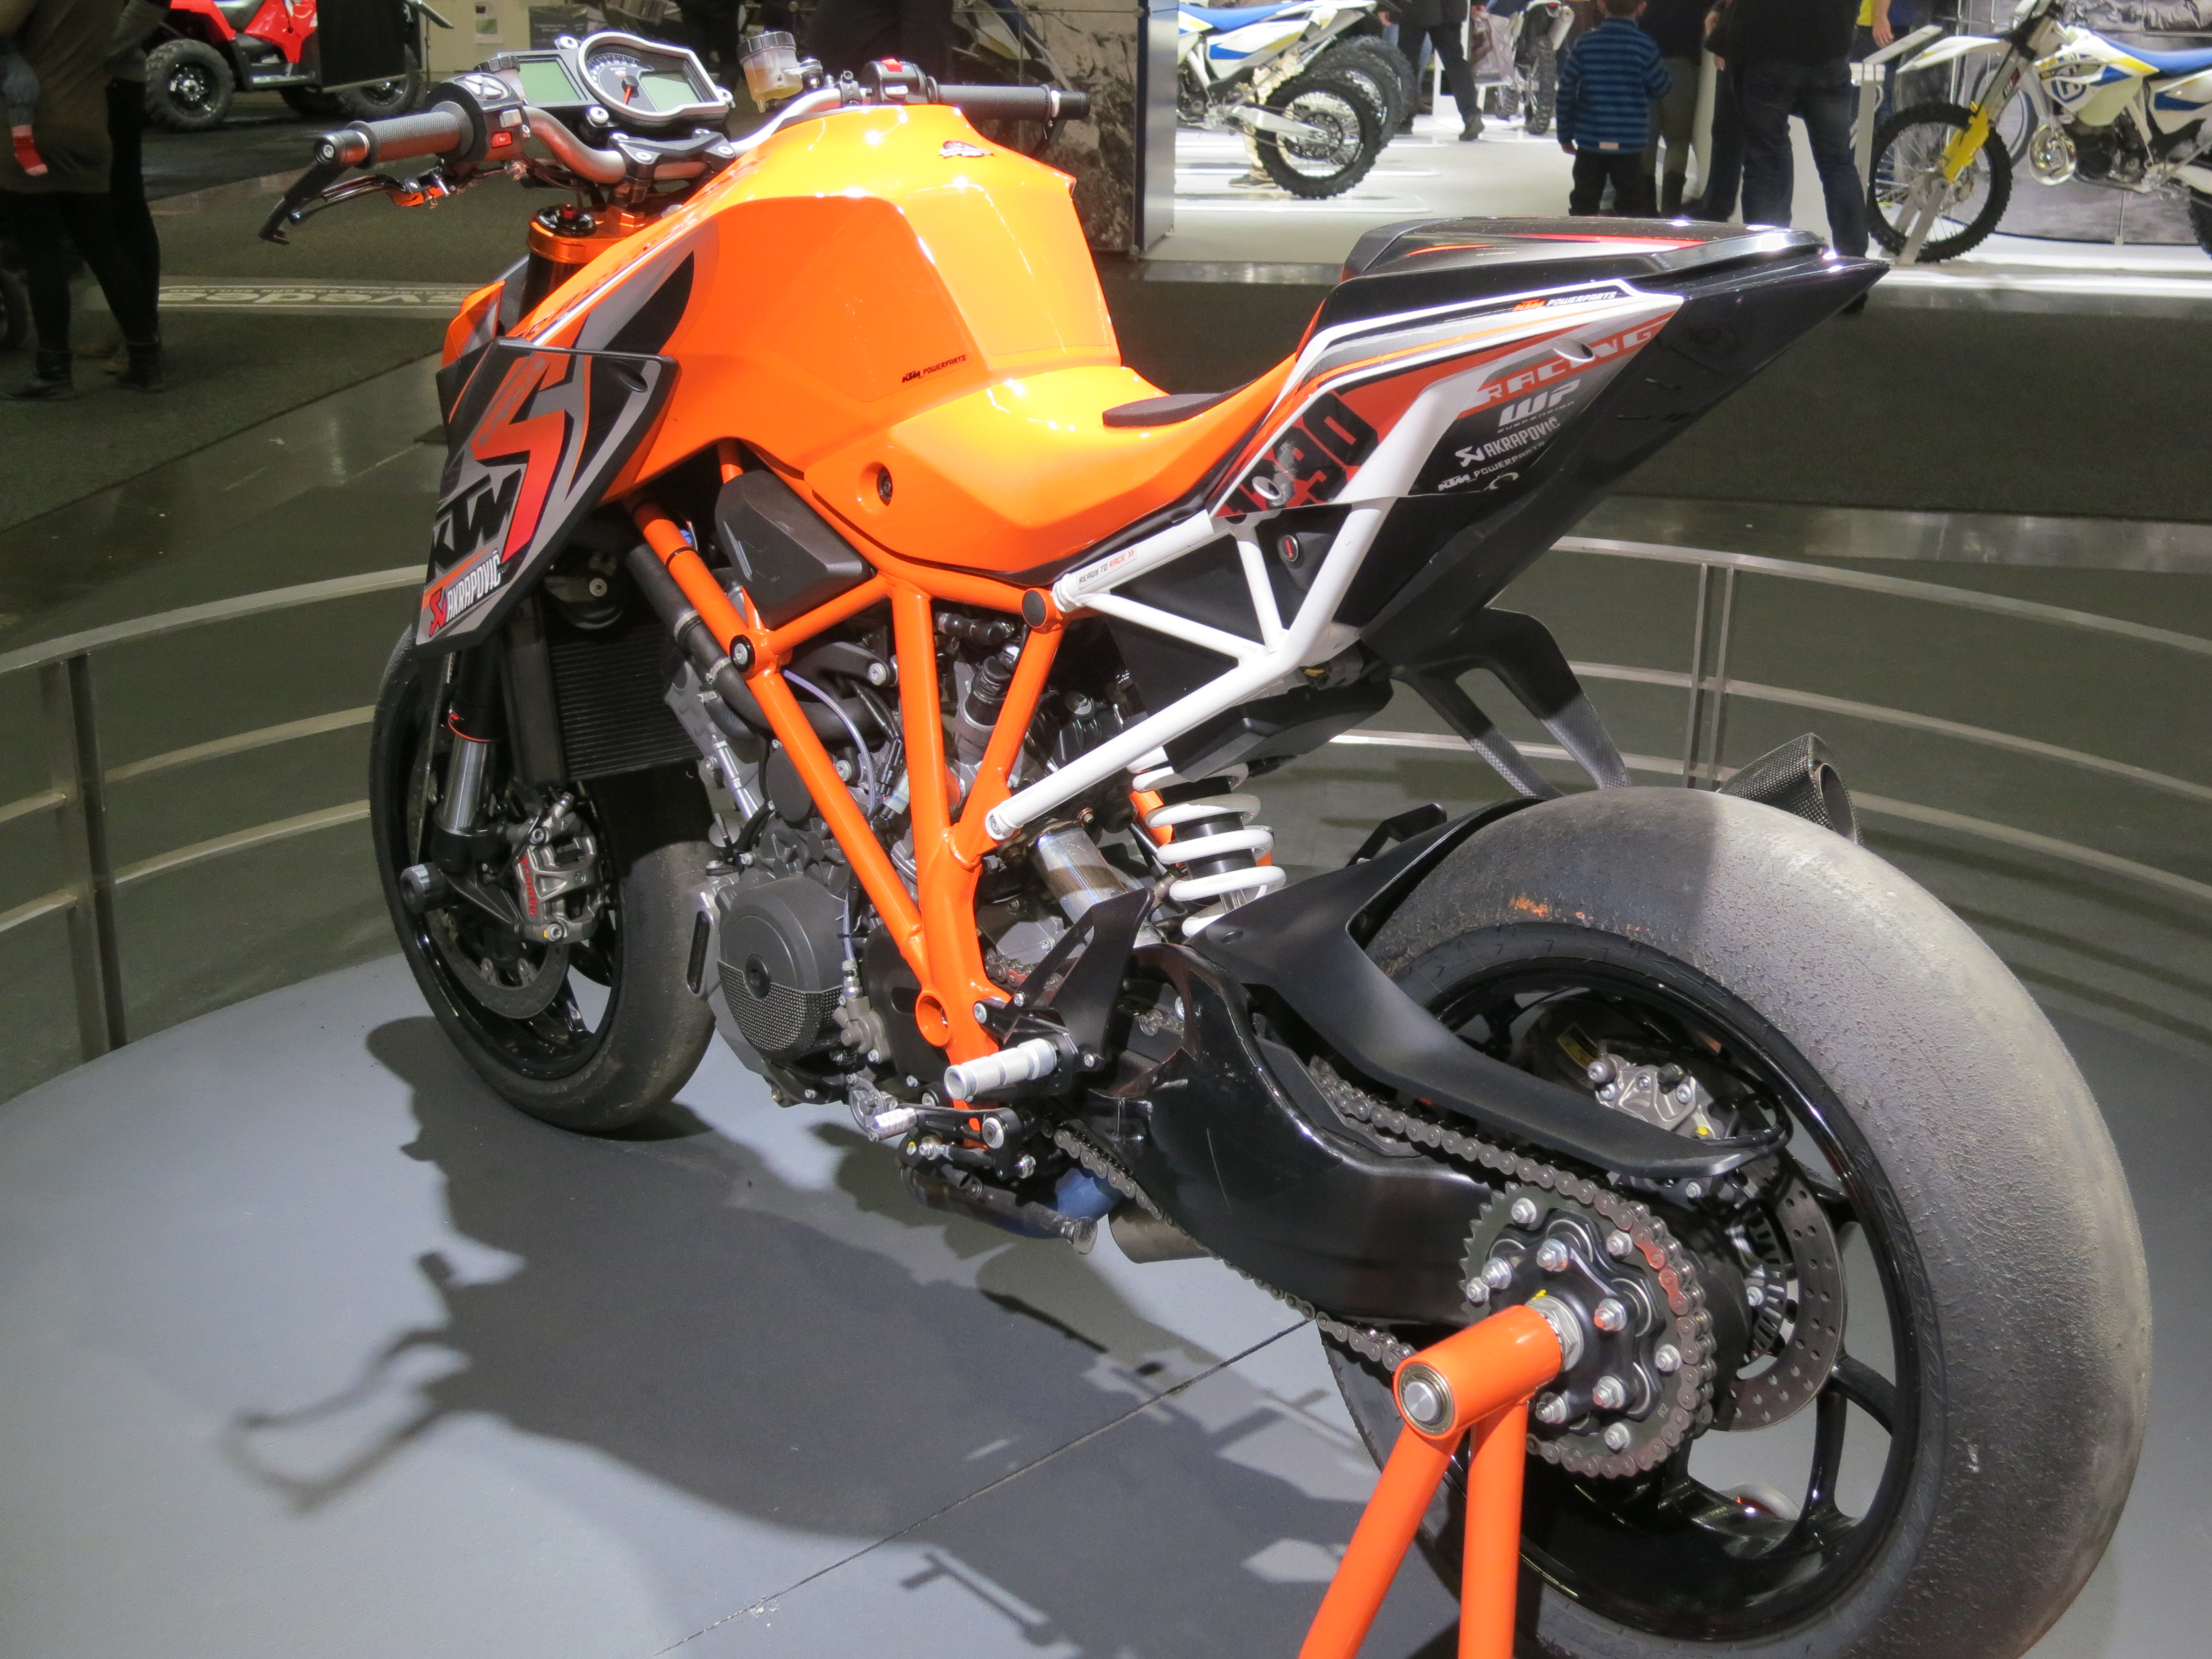 ktm-1290-super-duke-r-2014-2